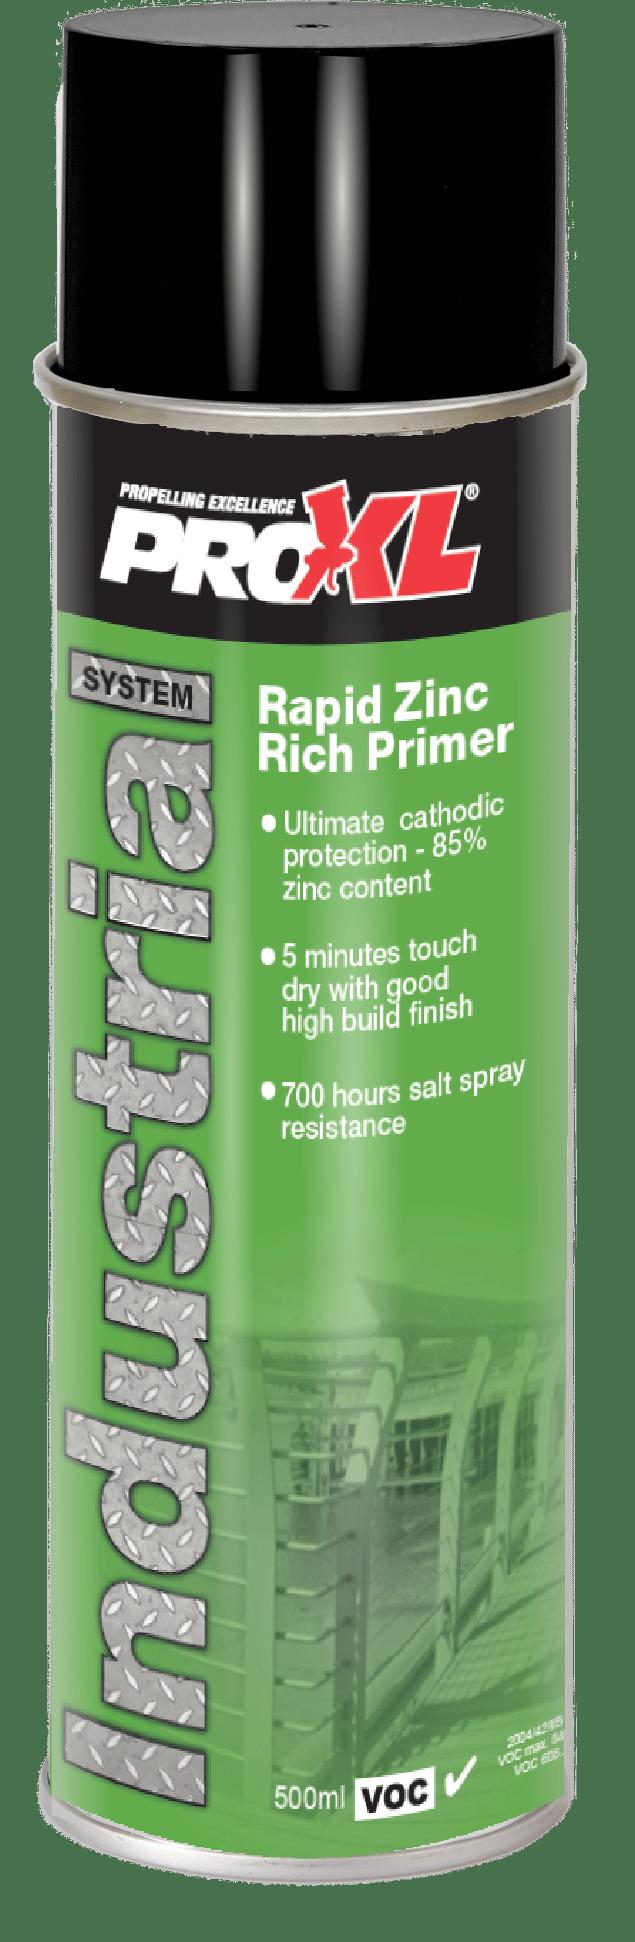 Rapid Zinc Rich Primer Aerosol (500ml) Product Image